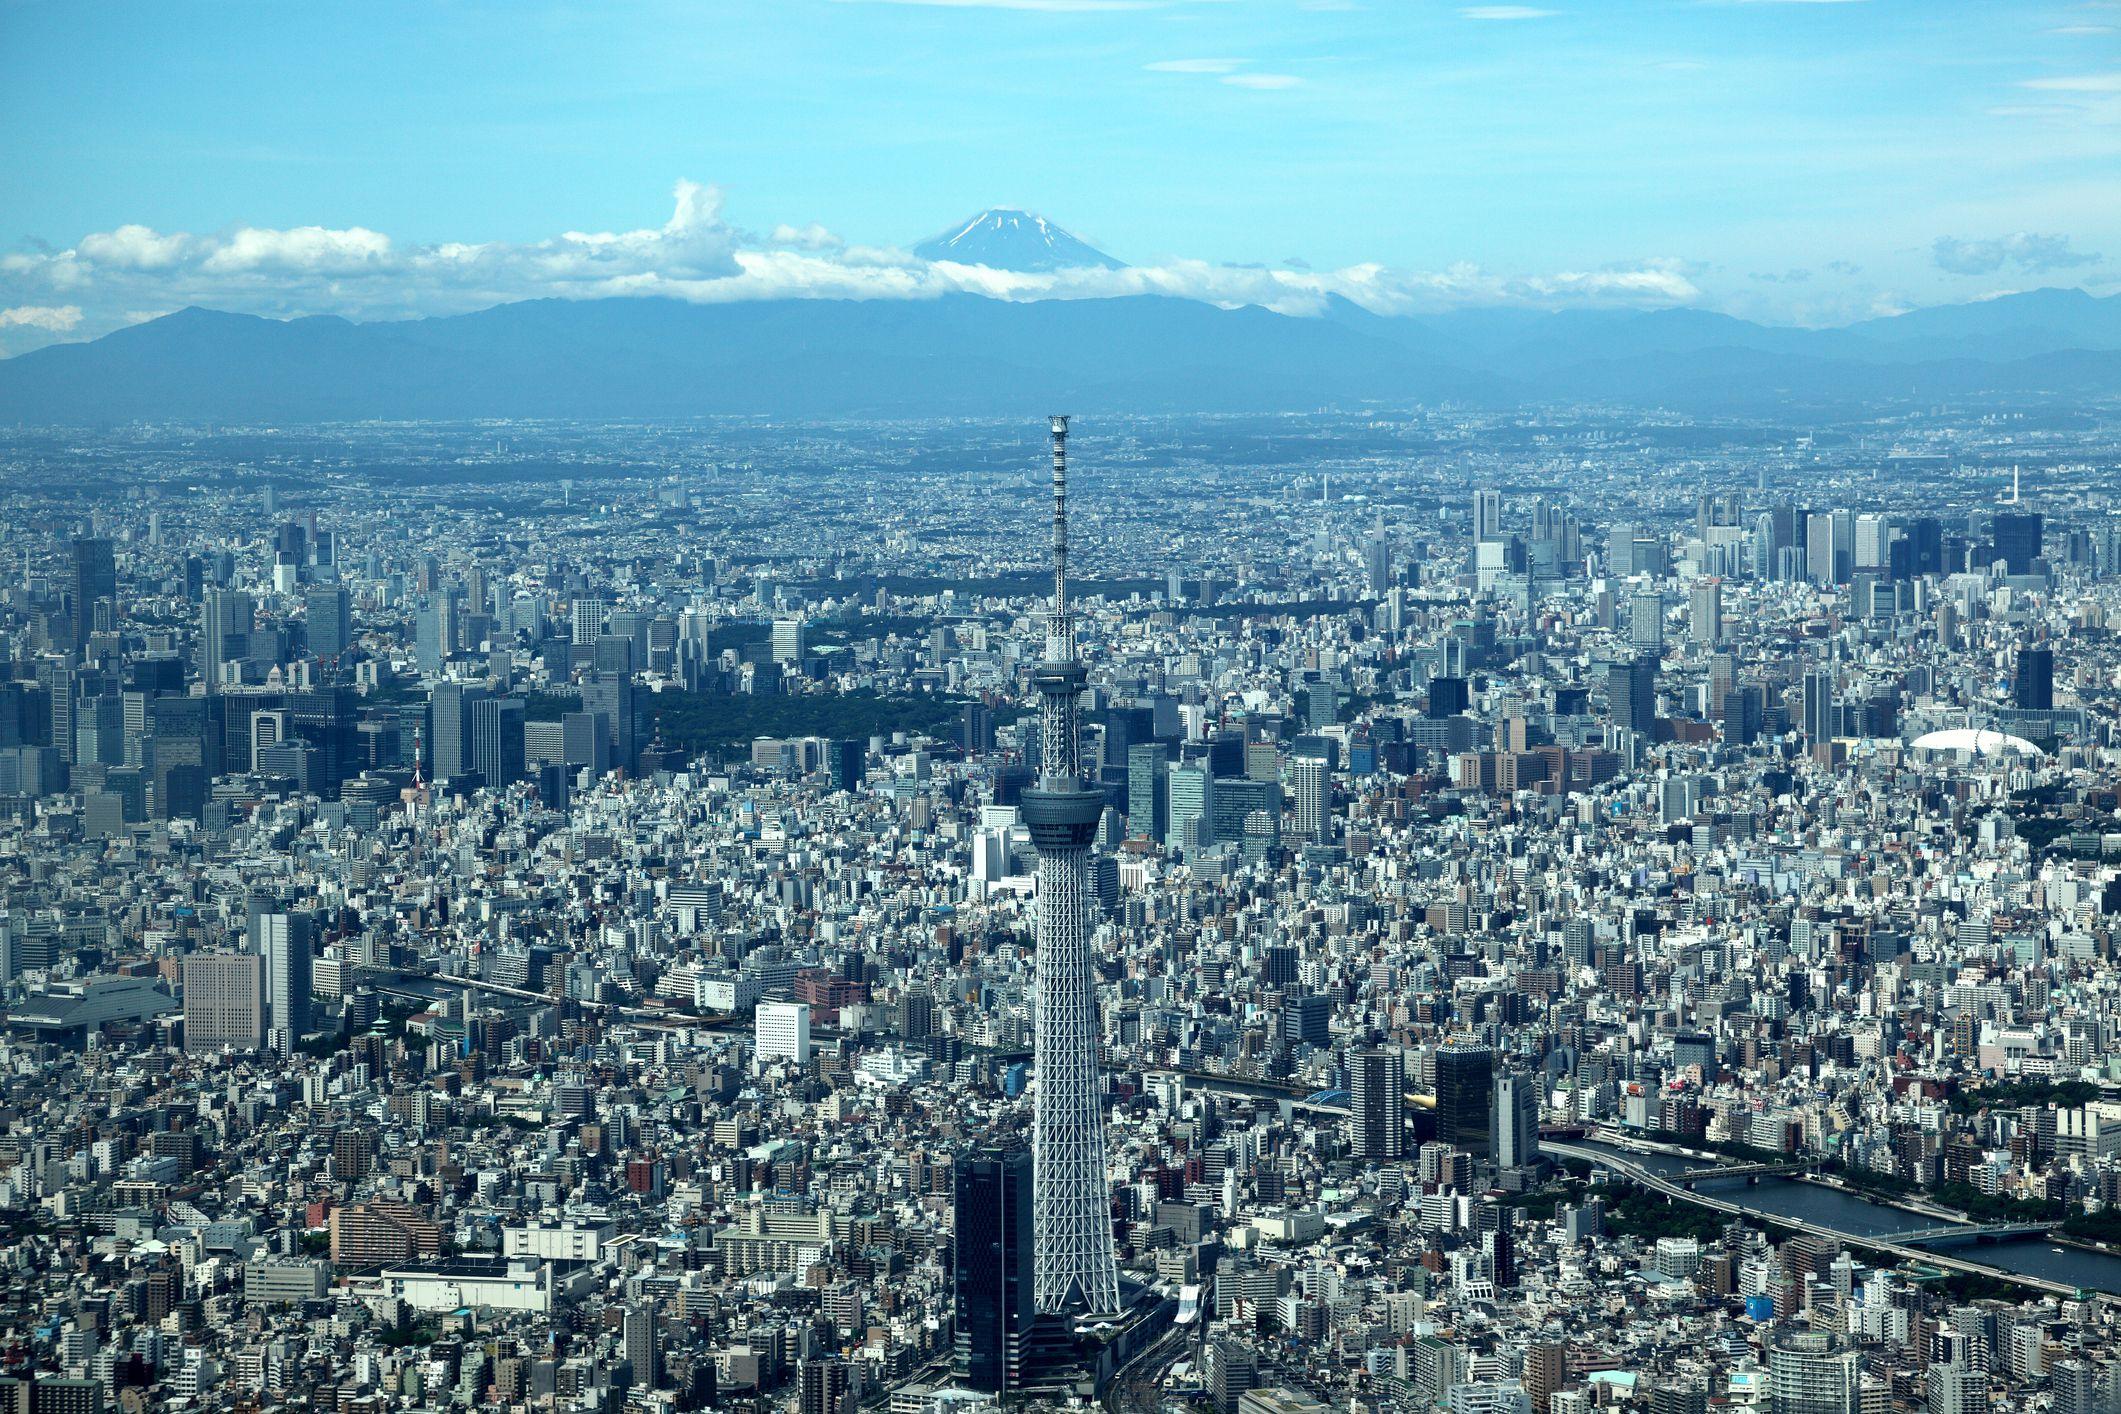 Tokyo Sky Tree and Mt. Fuji